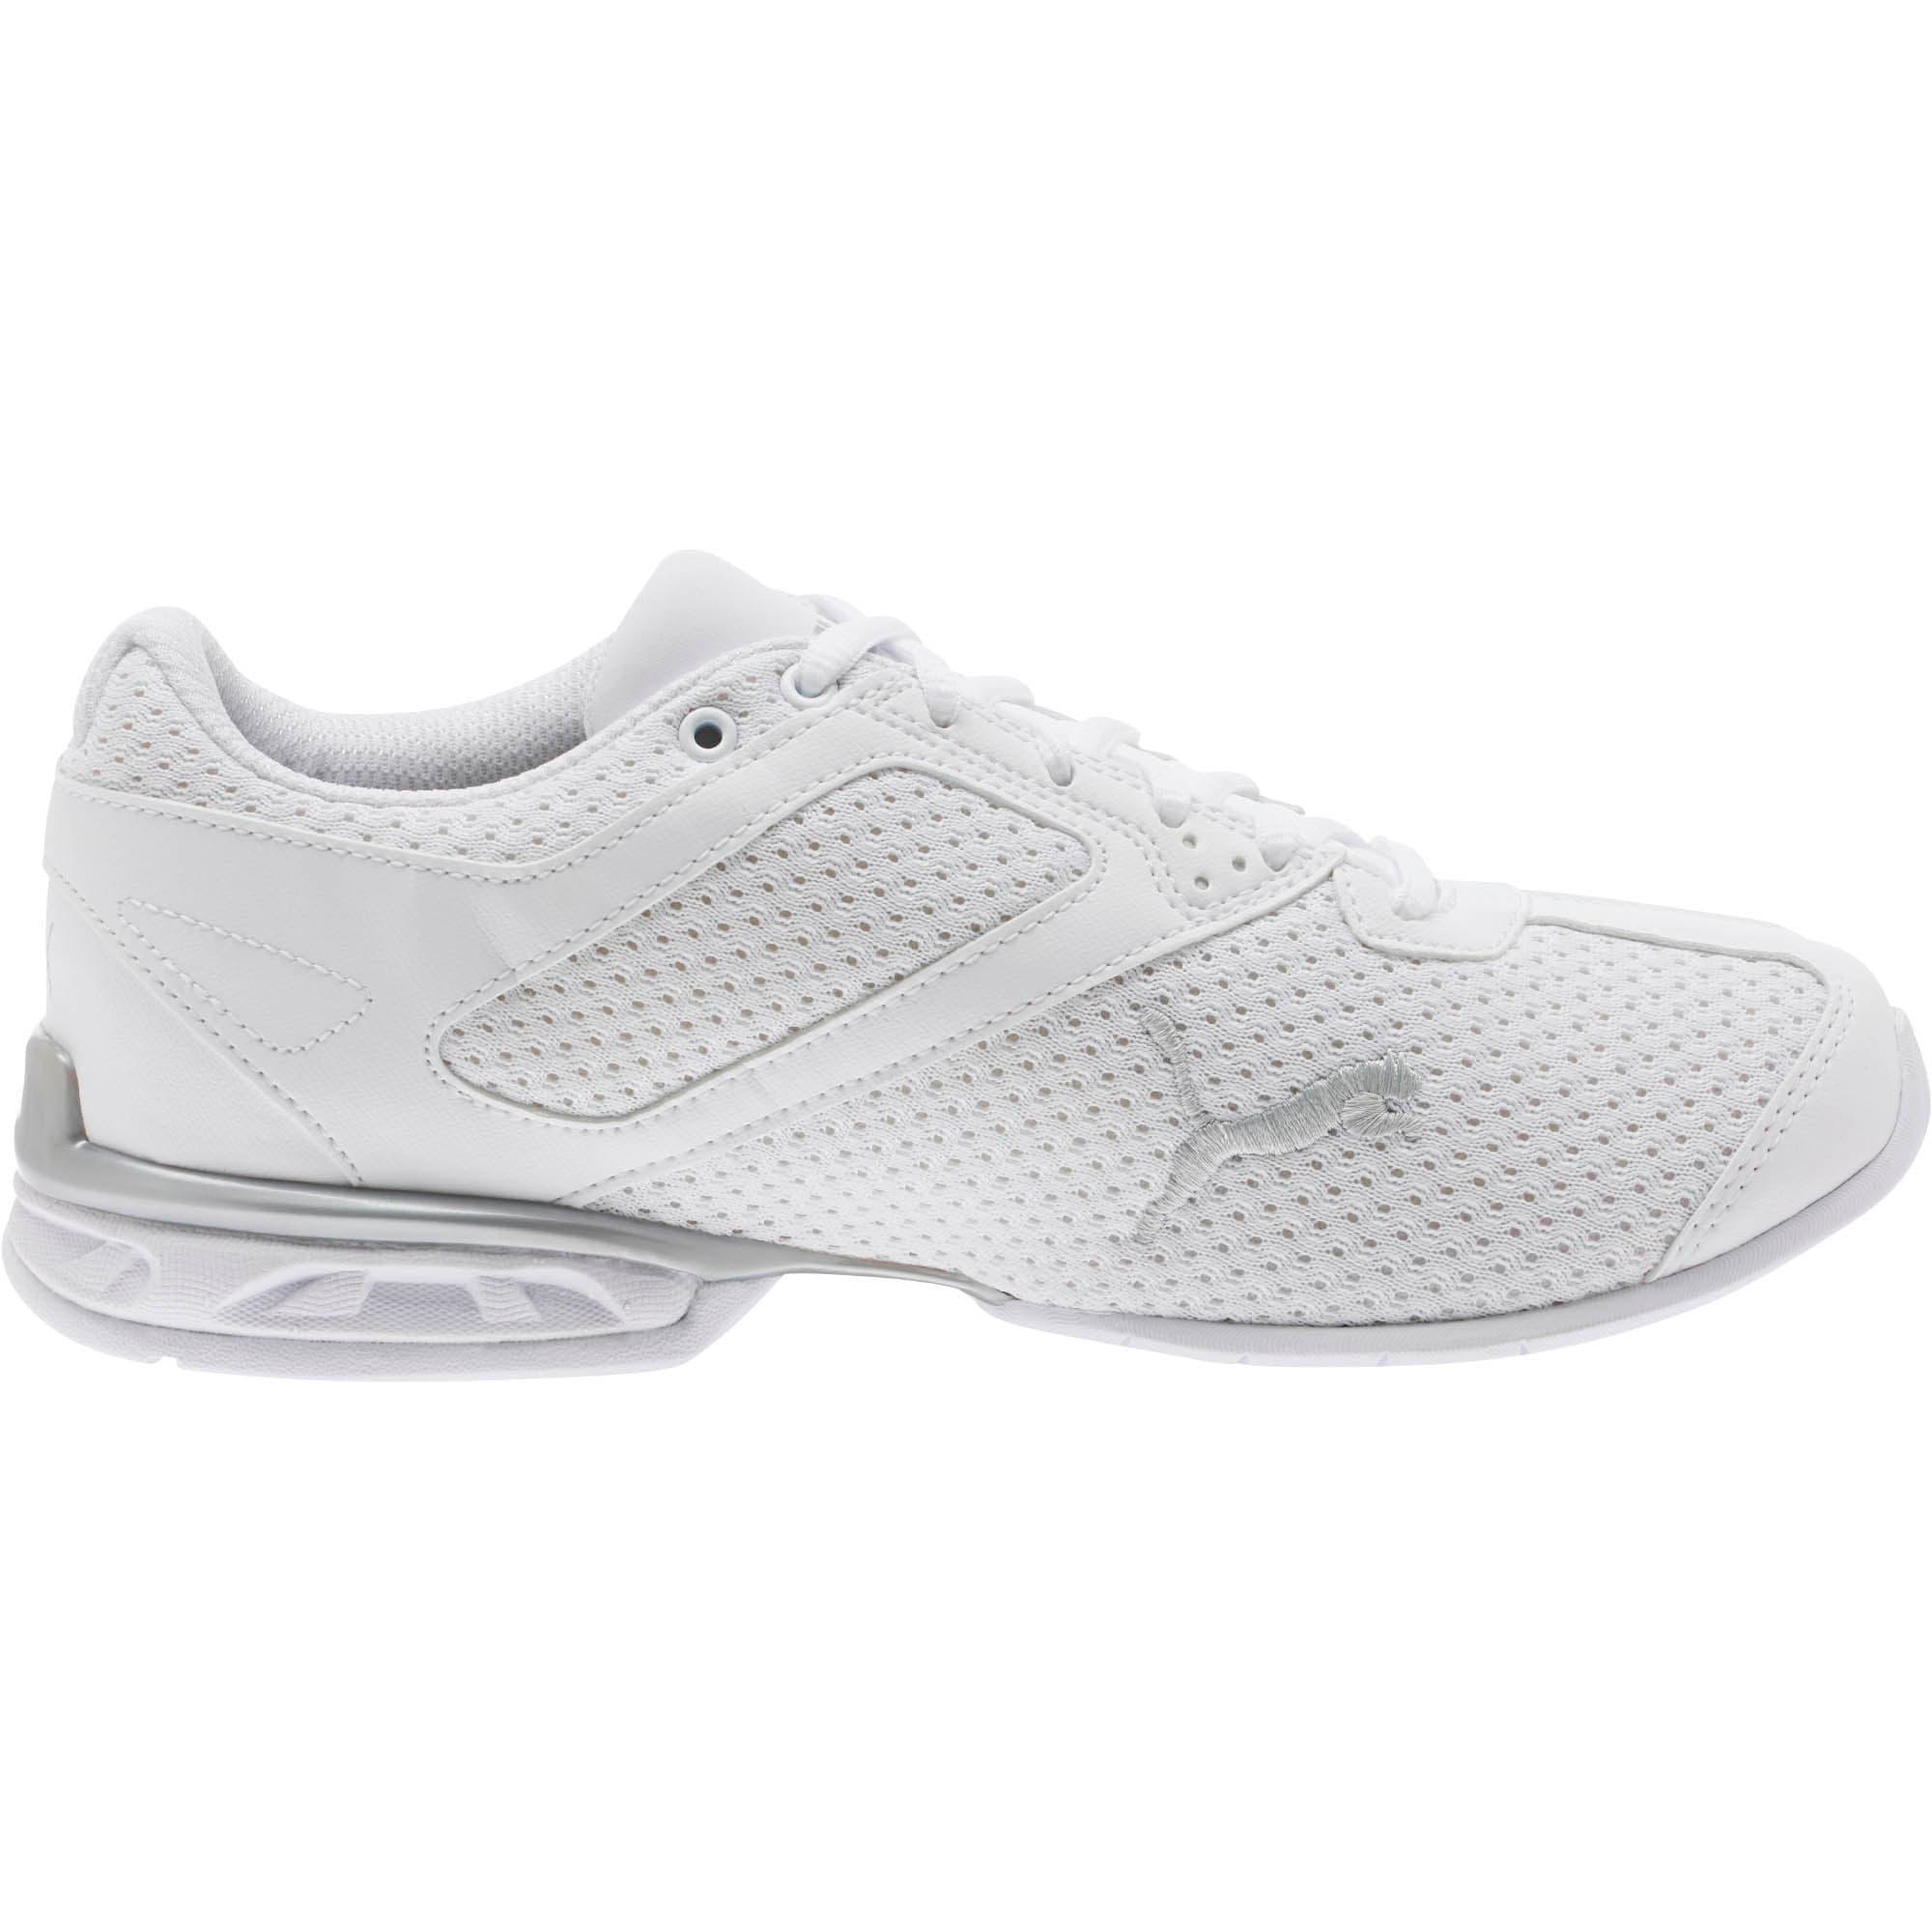 Thumbnail 3 of Tazon 6 Knit Women's Sneakers, Puma White-Puma Silver, medium